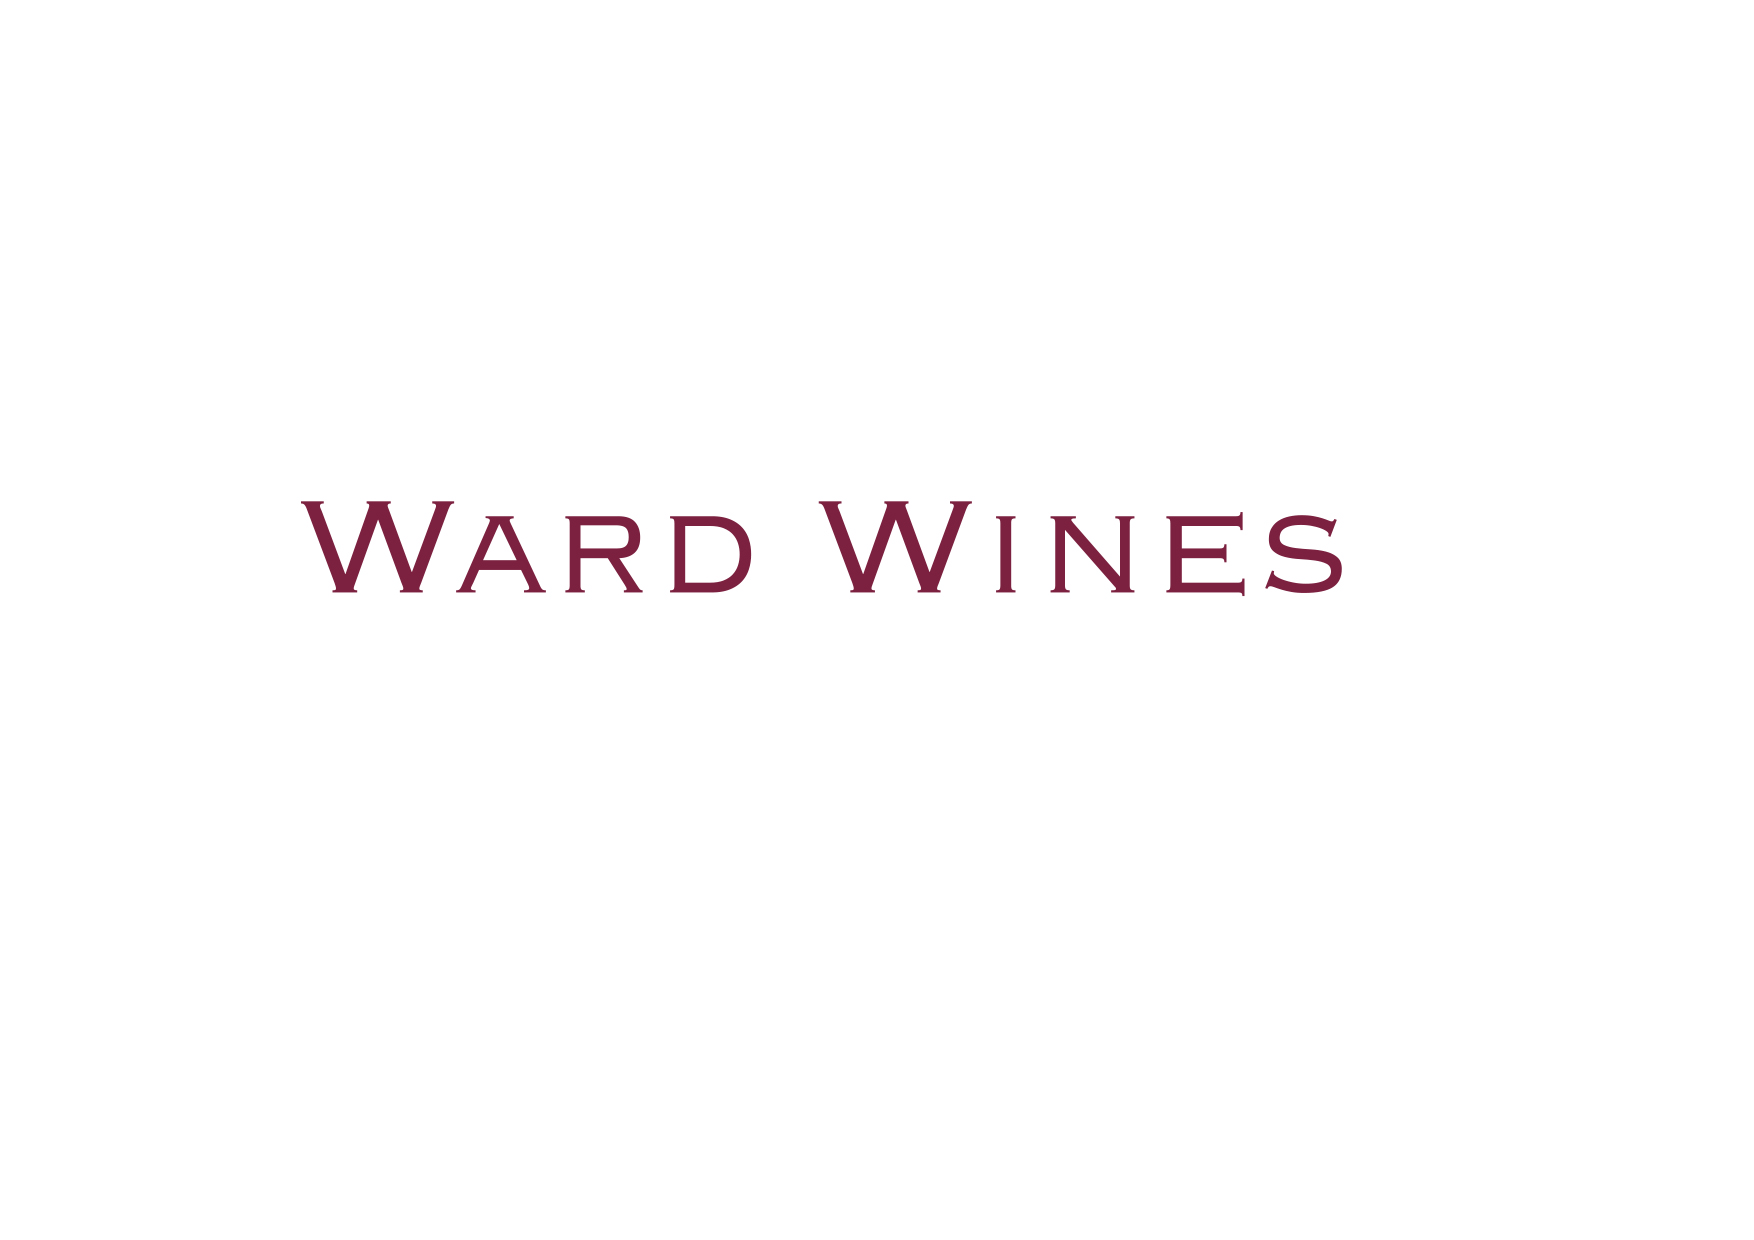 Ward Wines.jpg